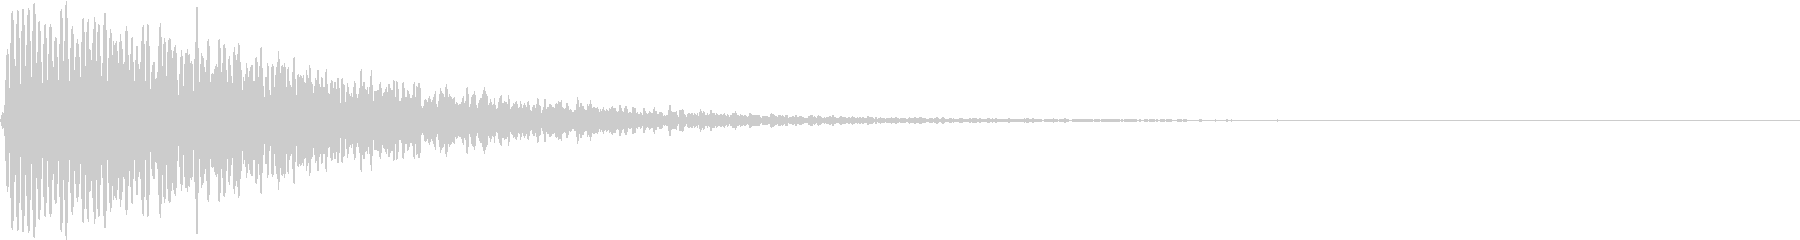 TVFX ホラーなホイッスル音の未再生の波形